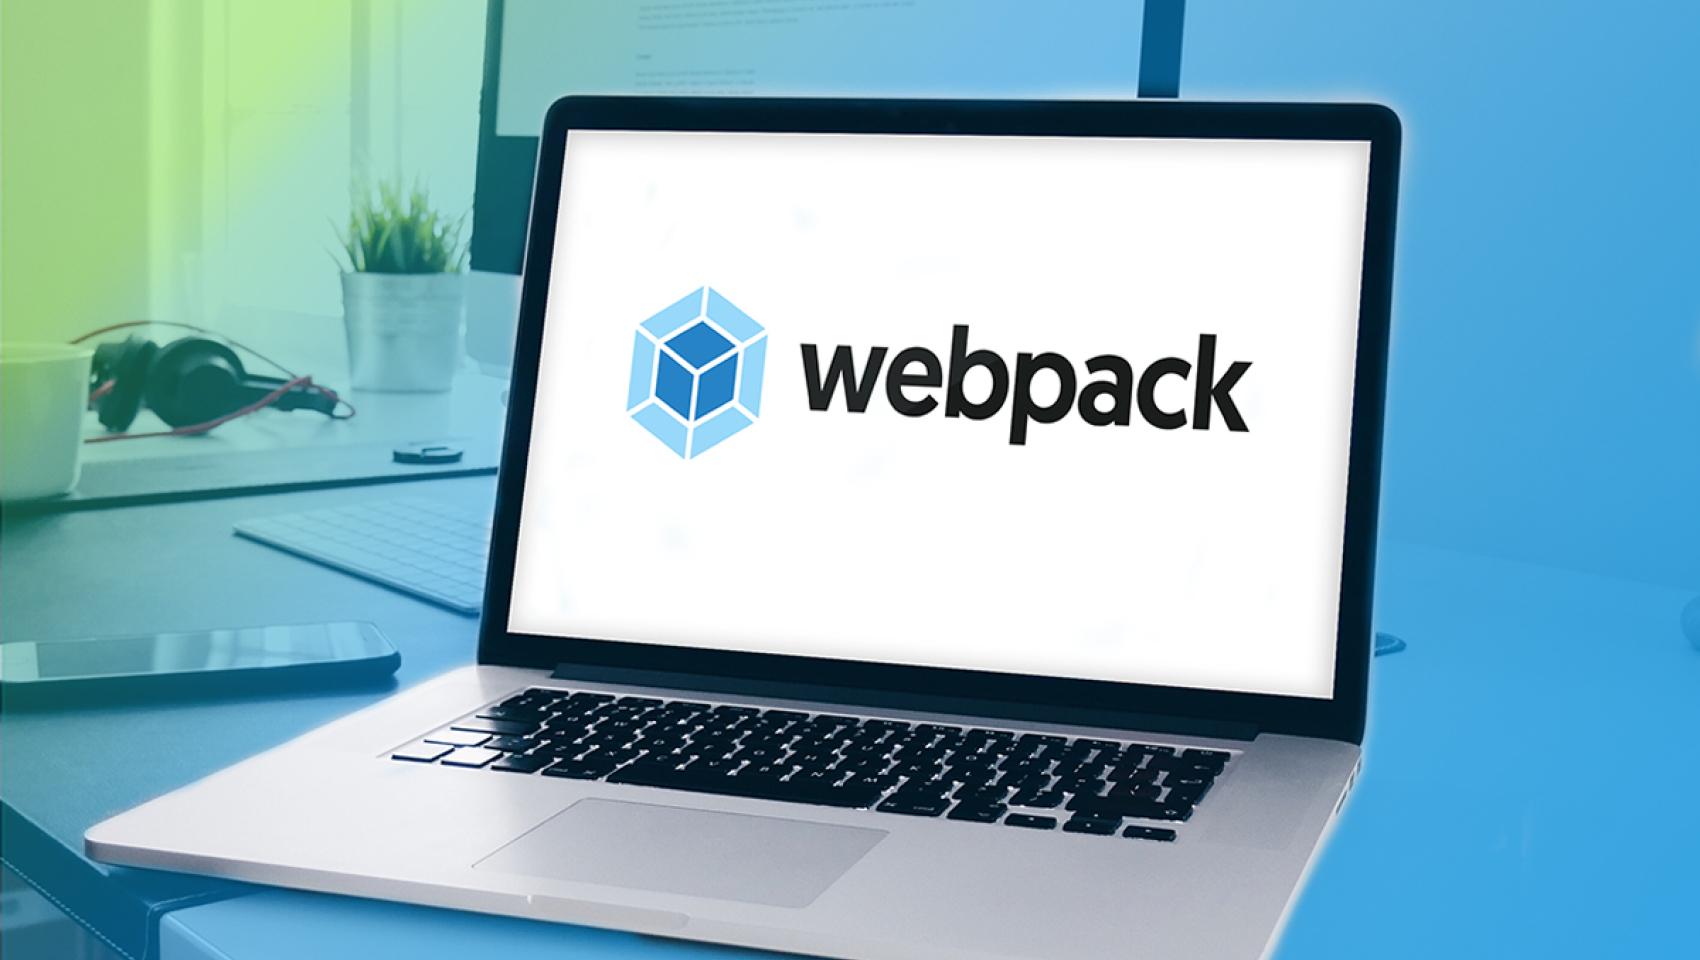 Что такое Webpack?